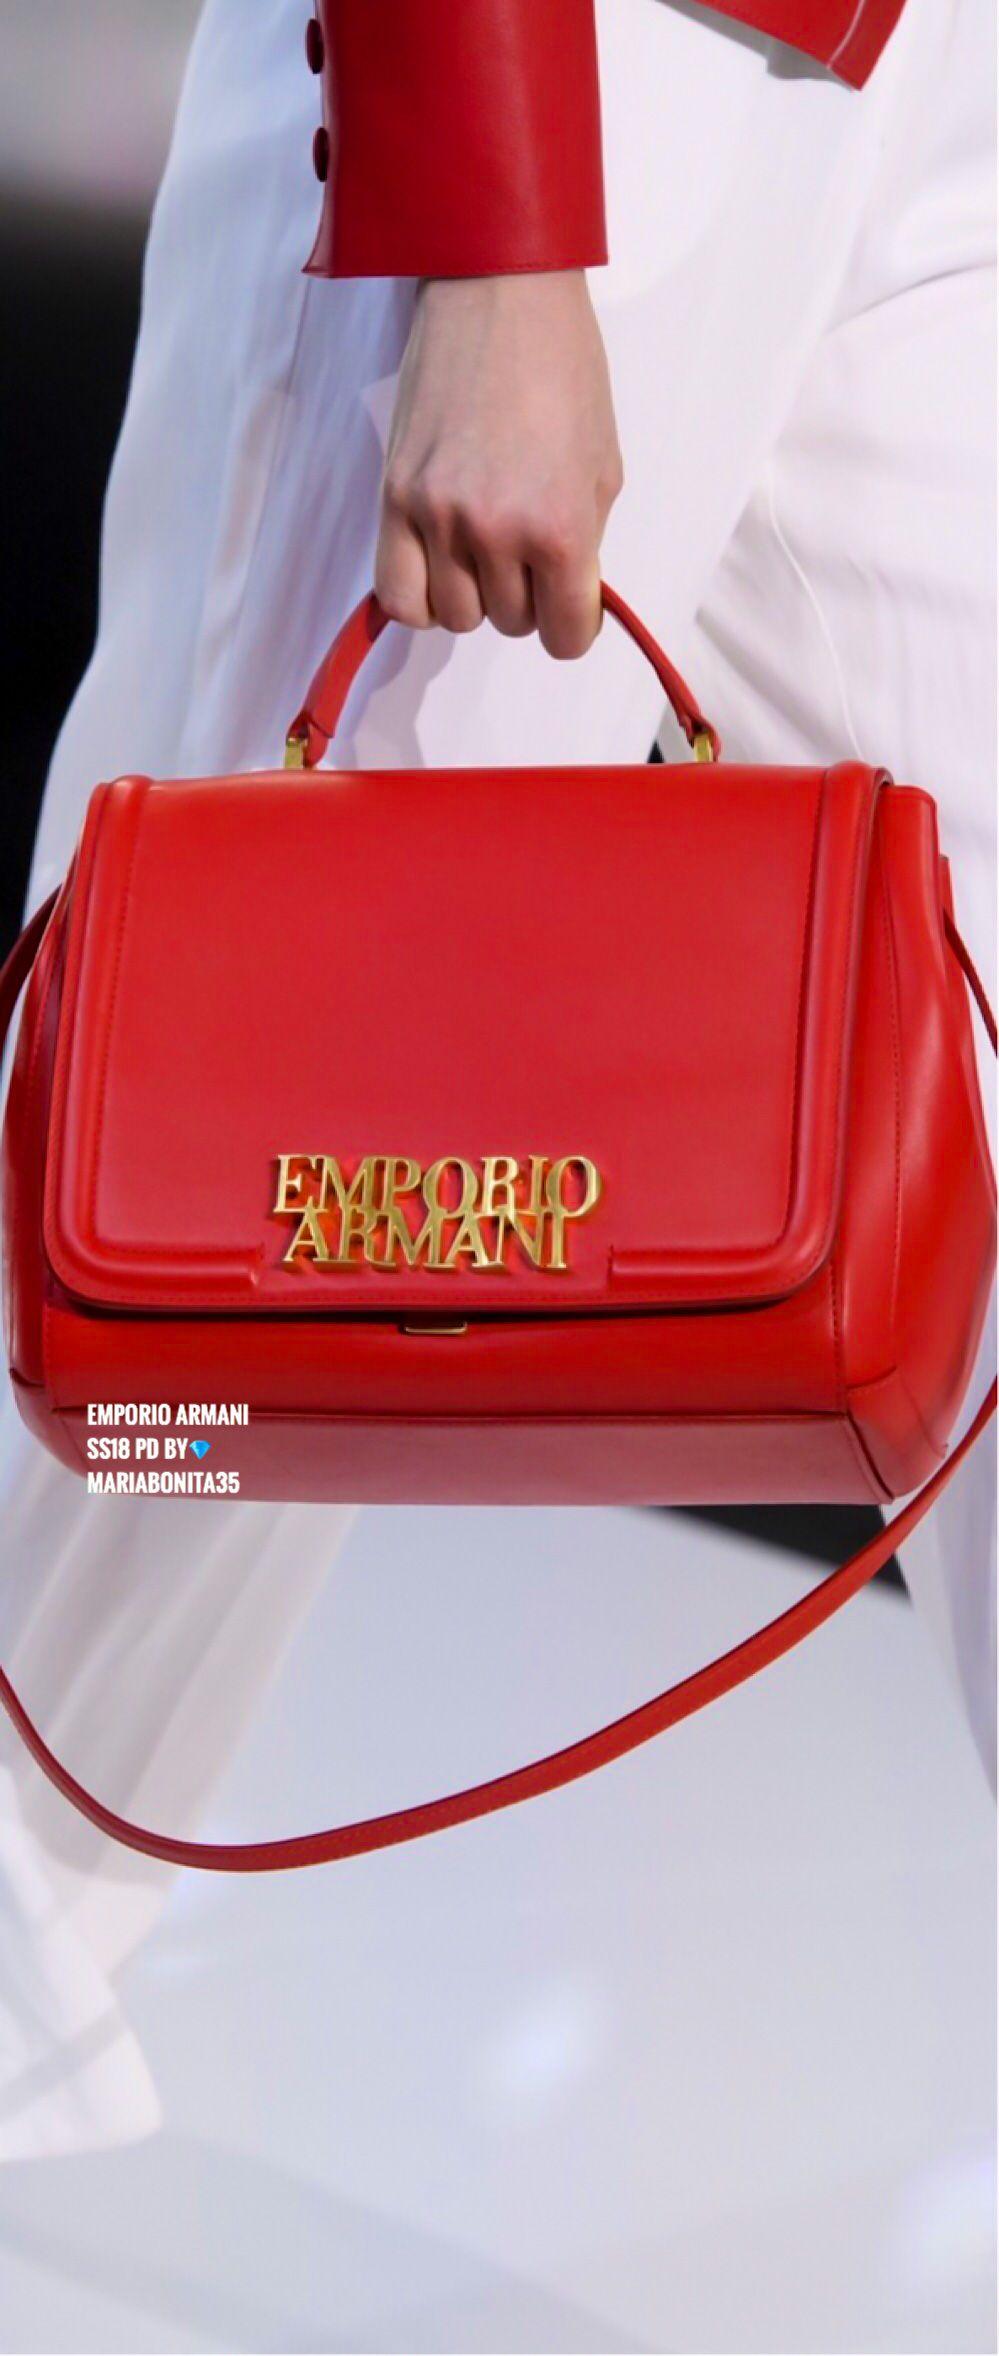 Emporio Armani Ss18 Rtw Details Armani Collection Fashion Handbags Handbag